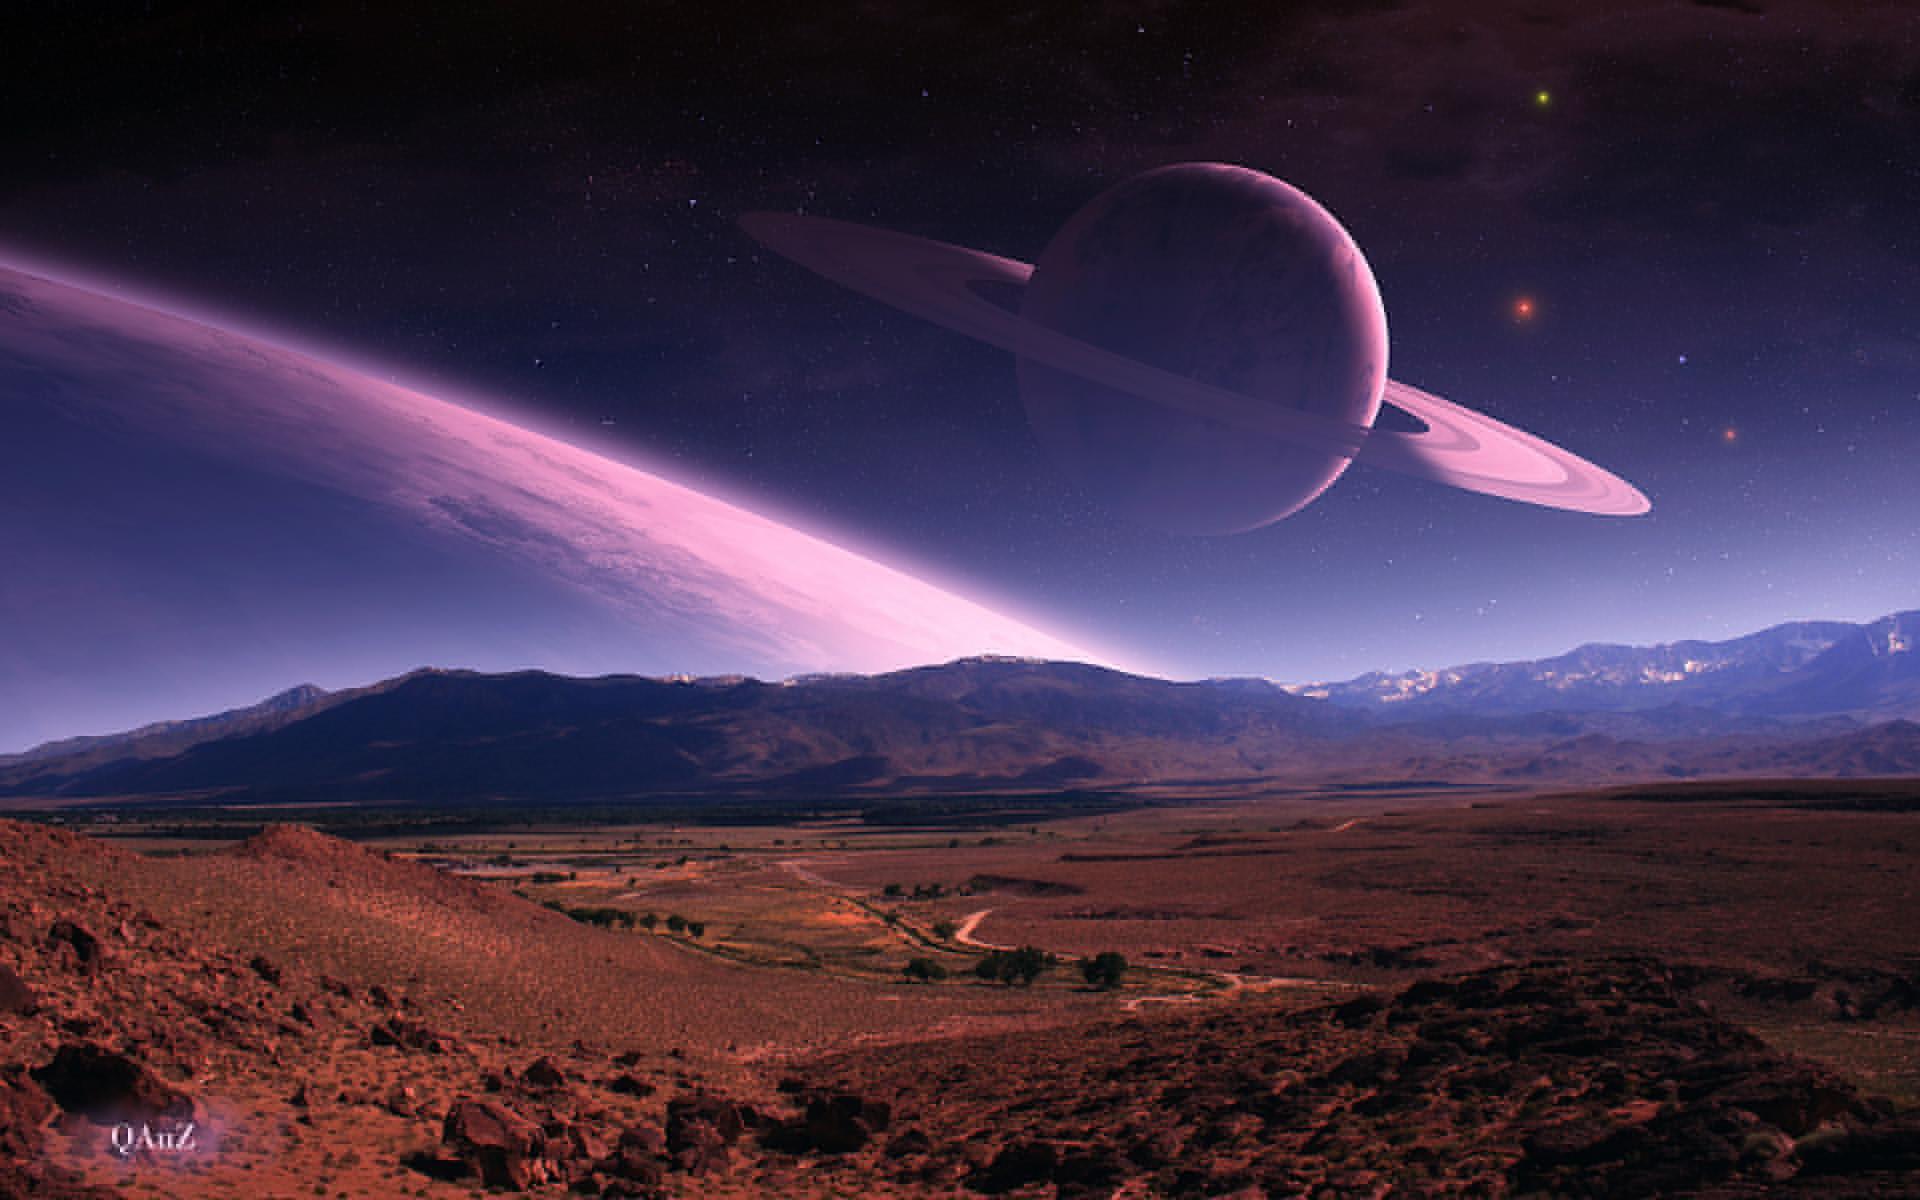 Quaz manipulation cg digital art nature landscapes fields hills mountains  planets scapes sky stars space sci fi science fiction wallpaper    …